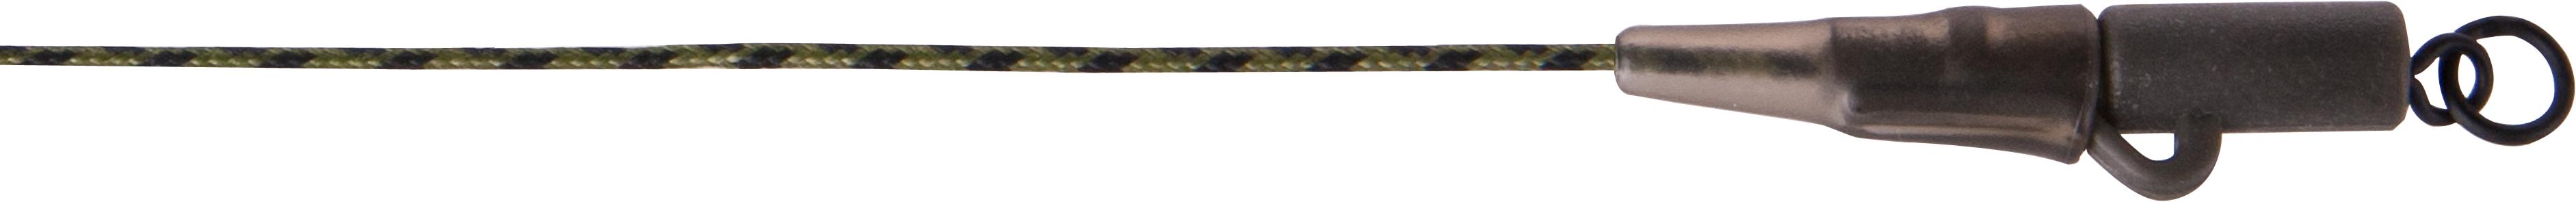 Anaconda závěs na olovo Safety Lead Clip 35 lb, 2ks/bal